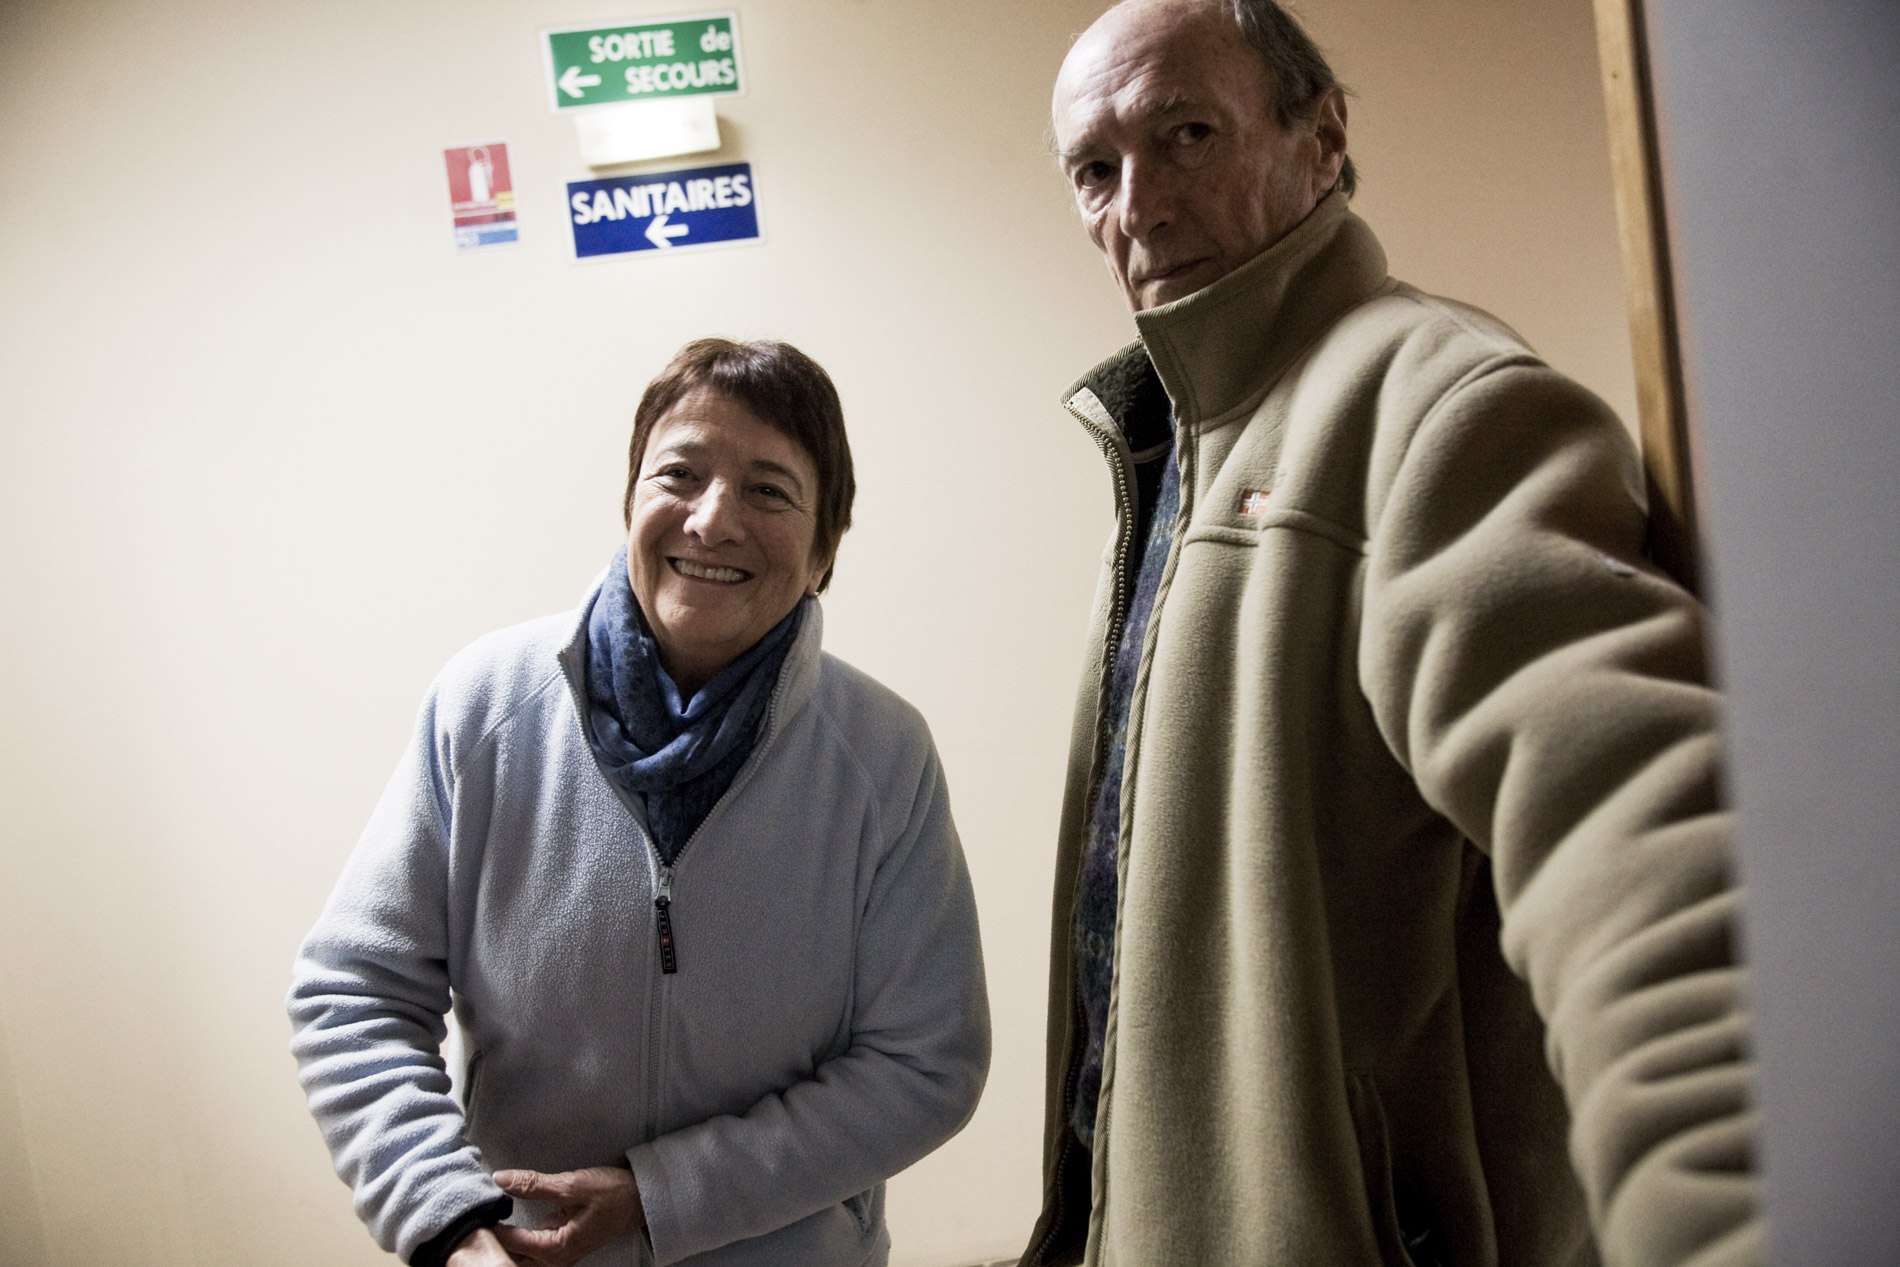 Arlette Laguiller, meeting Lutte Ouvriere